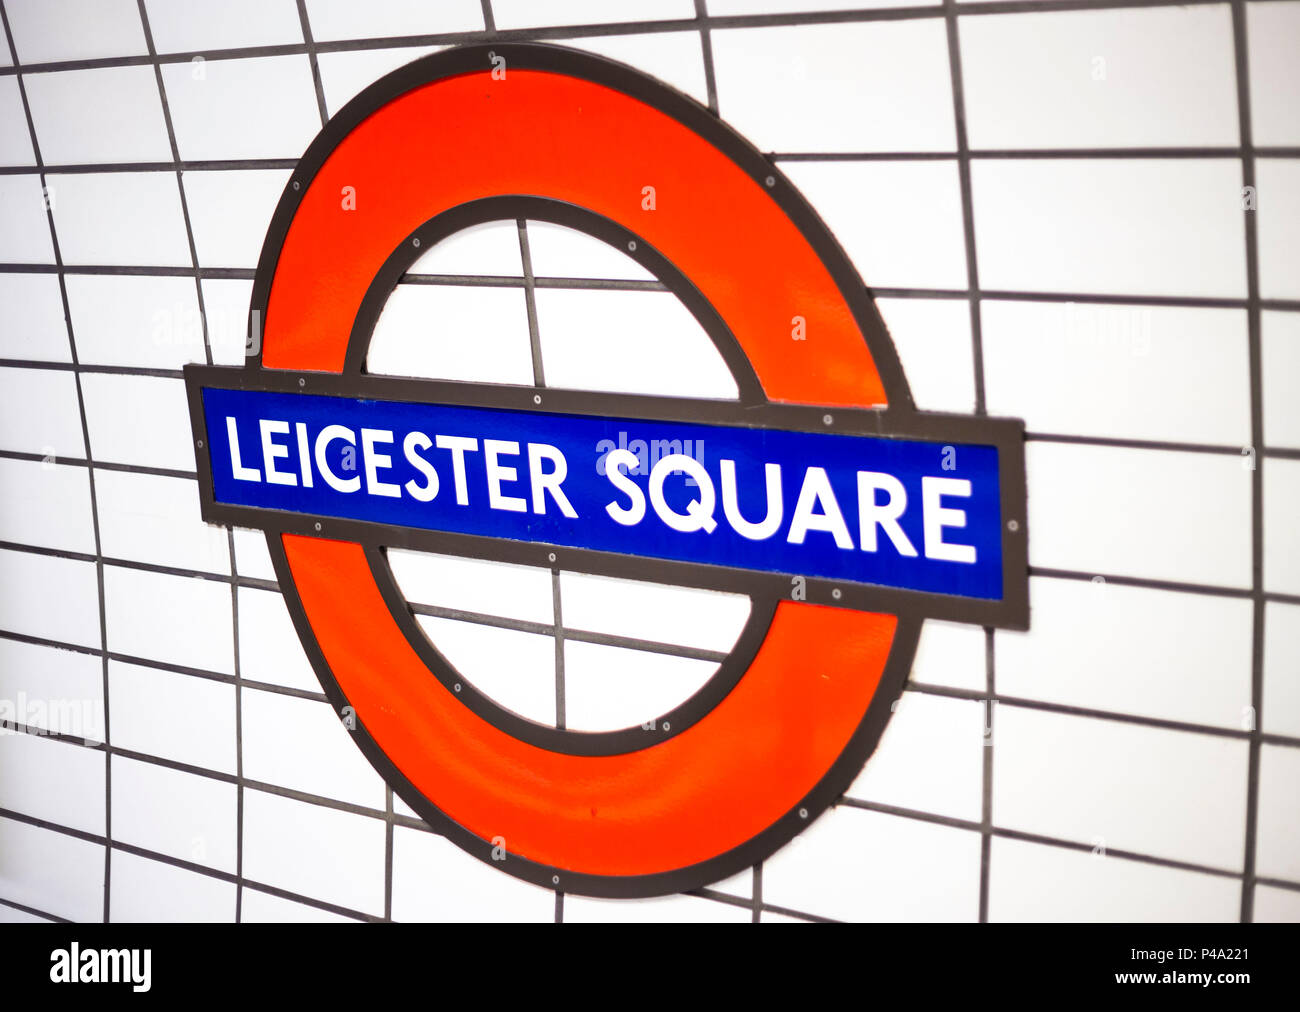 Leicester square tube station, London, United Kingdom. - Stock Image